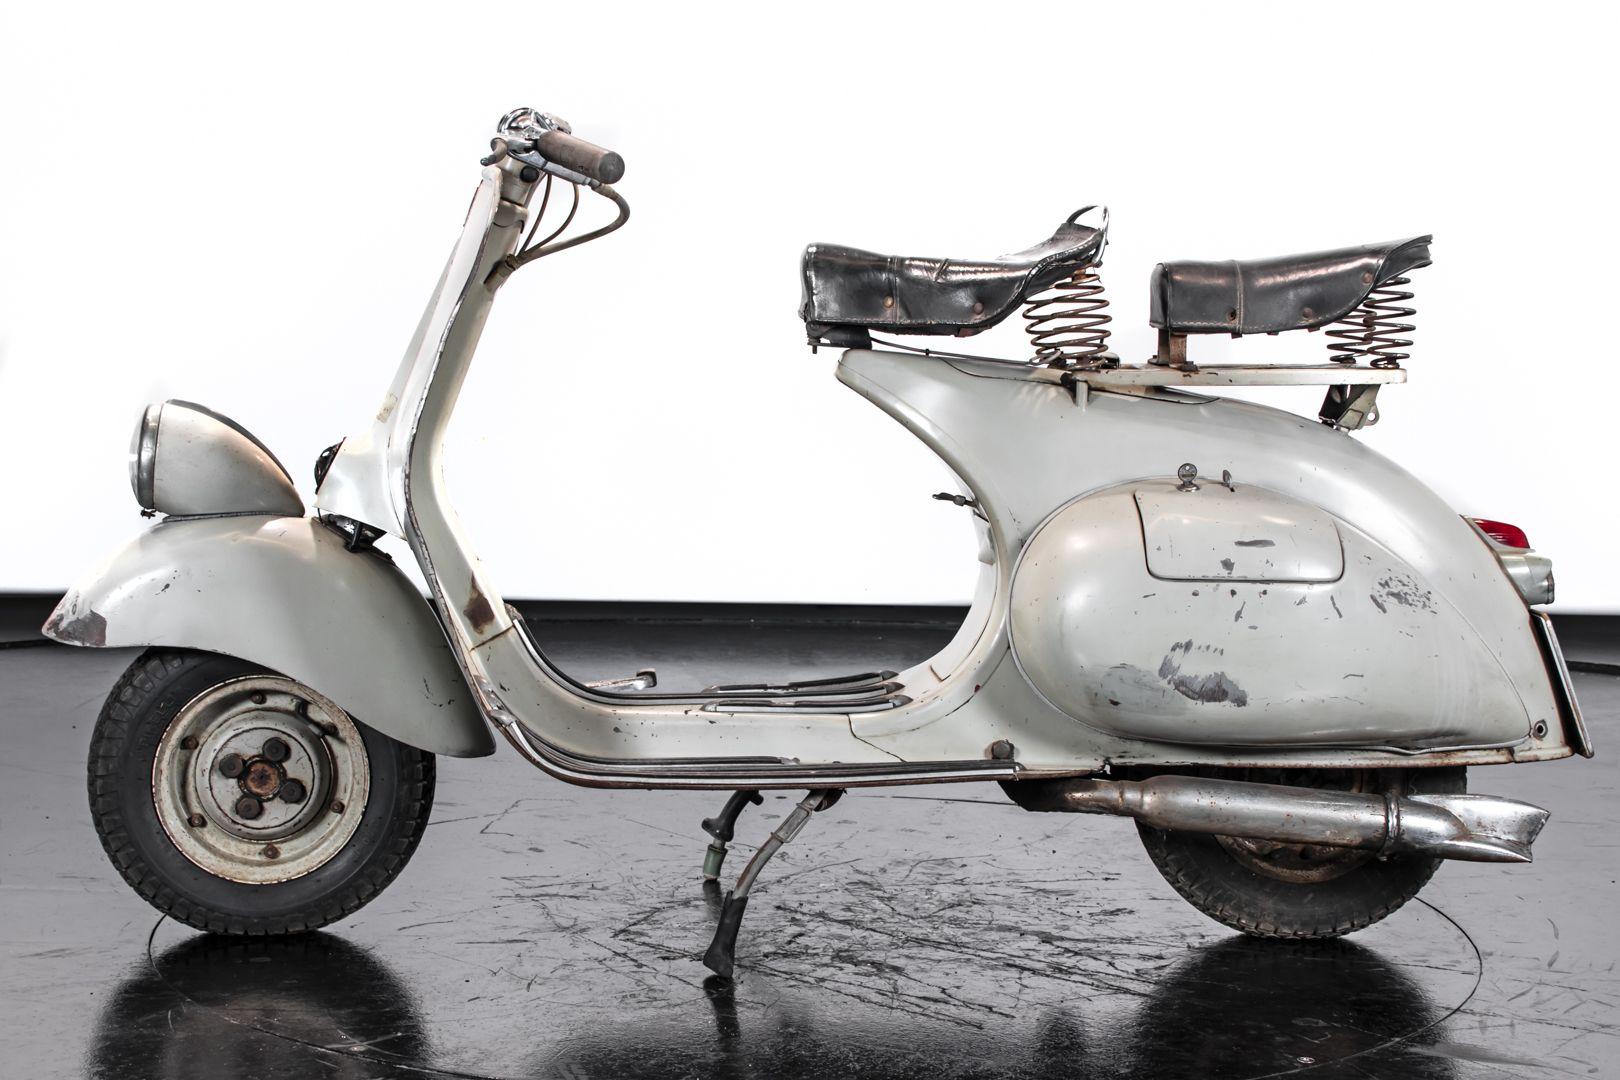 1953 Piaggio Vespa VM1 125  74129